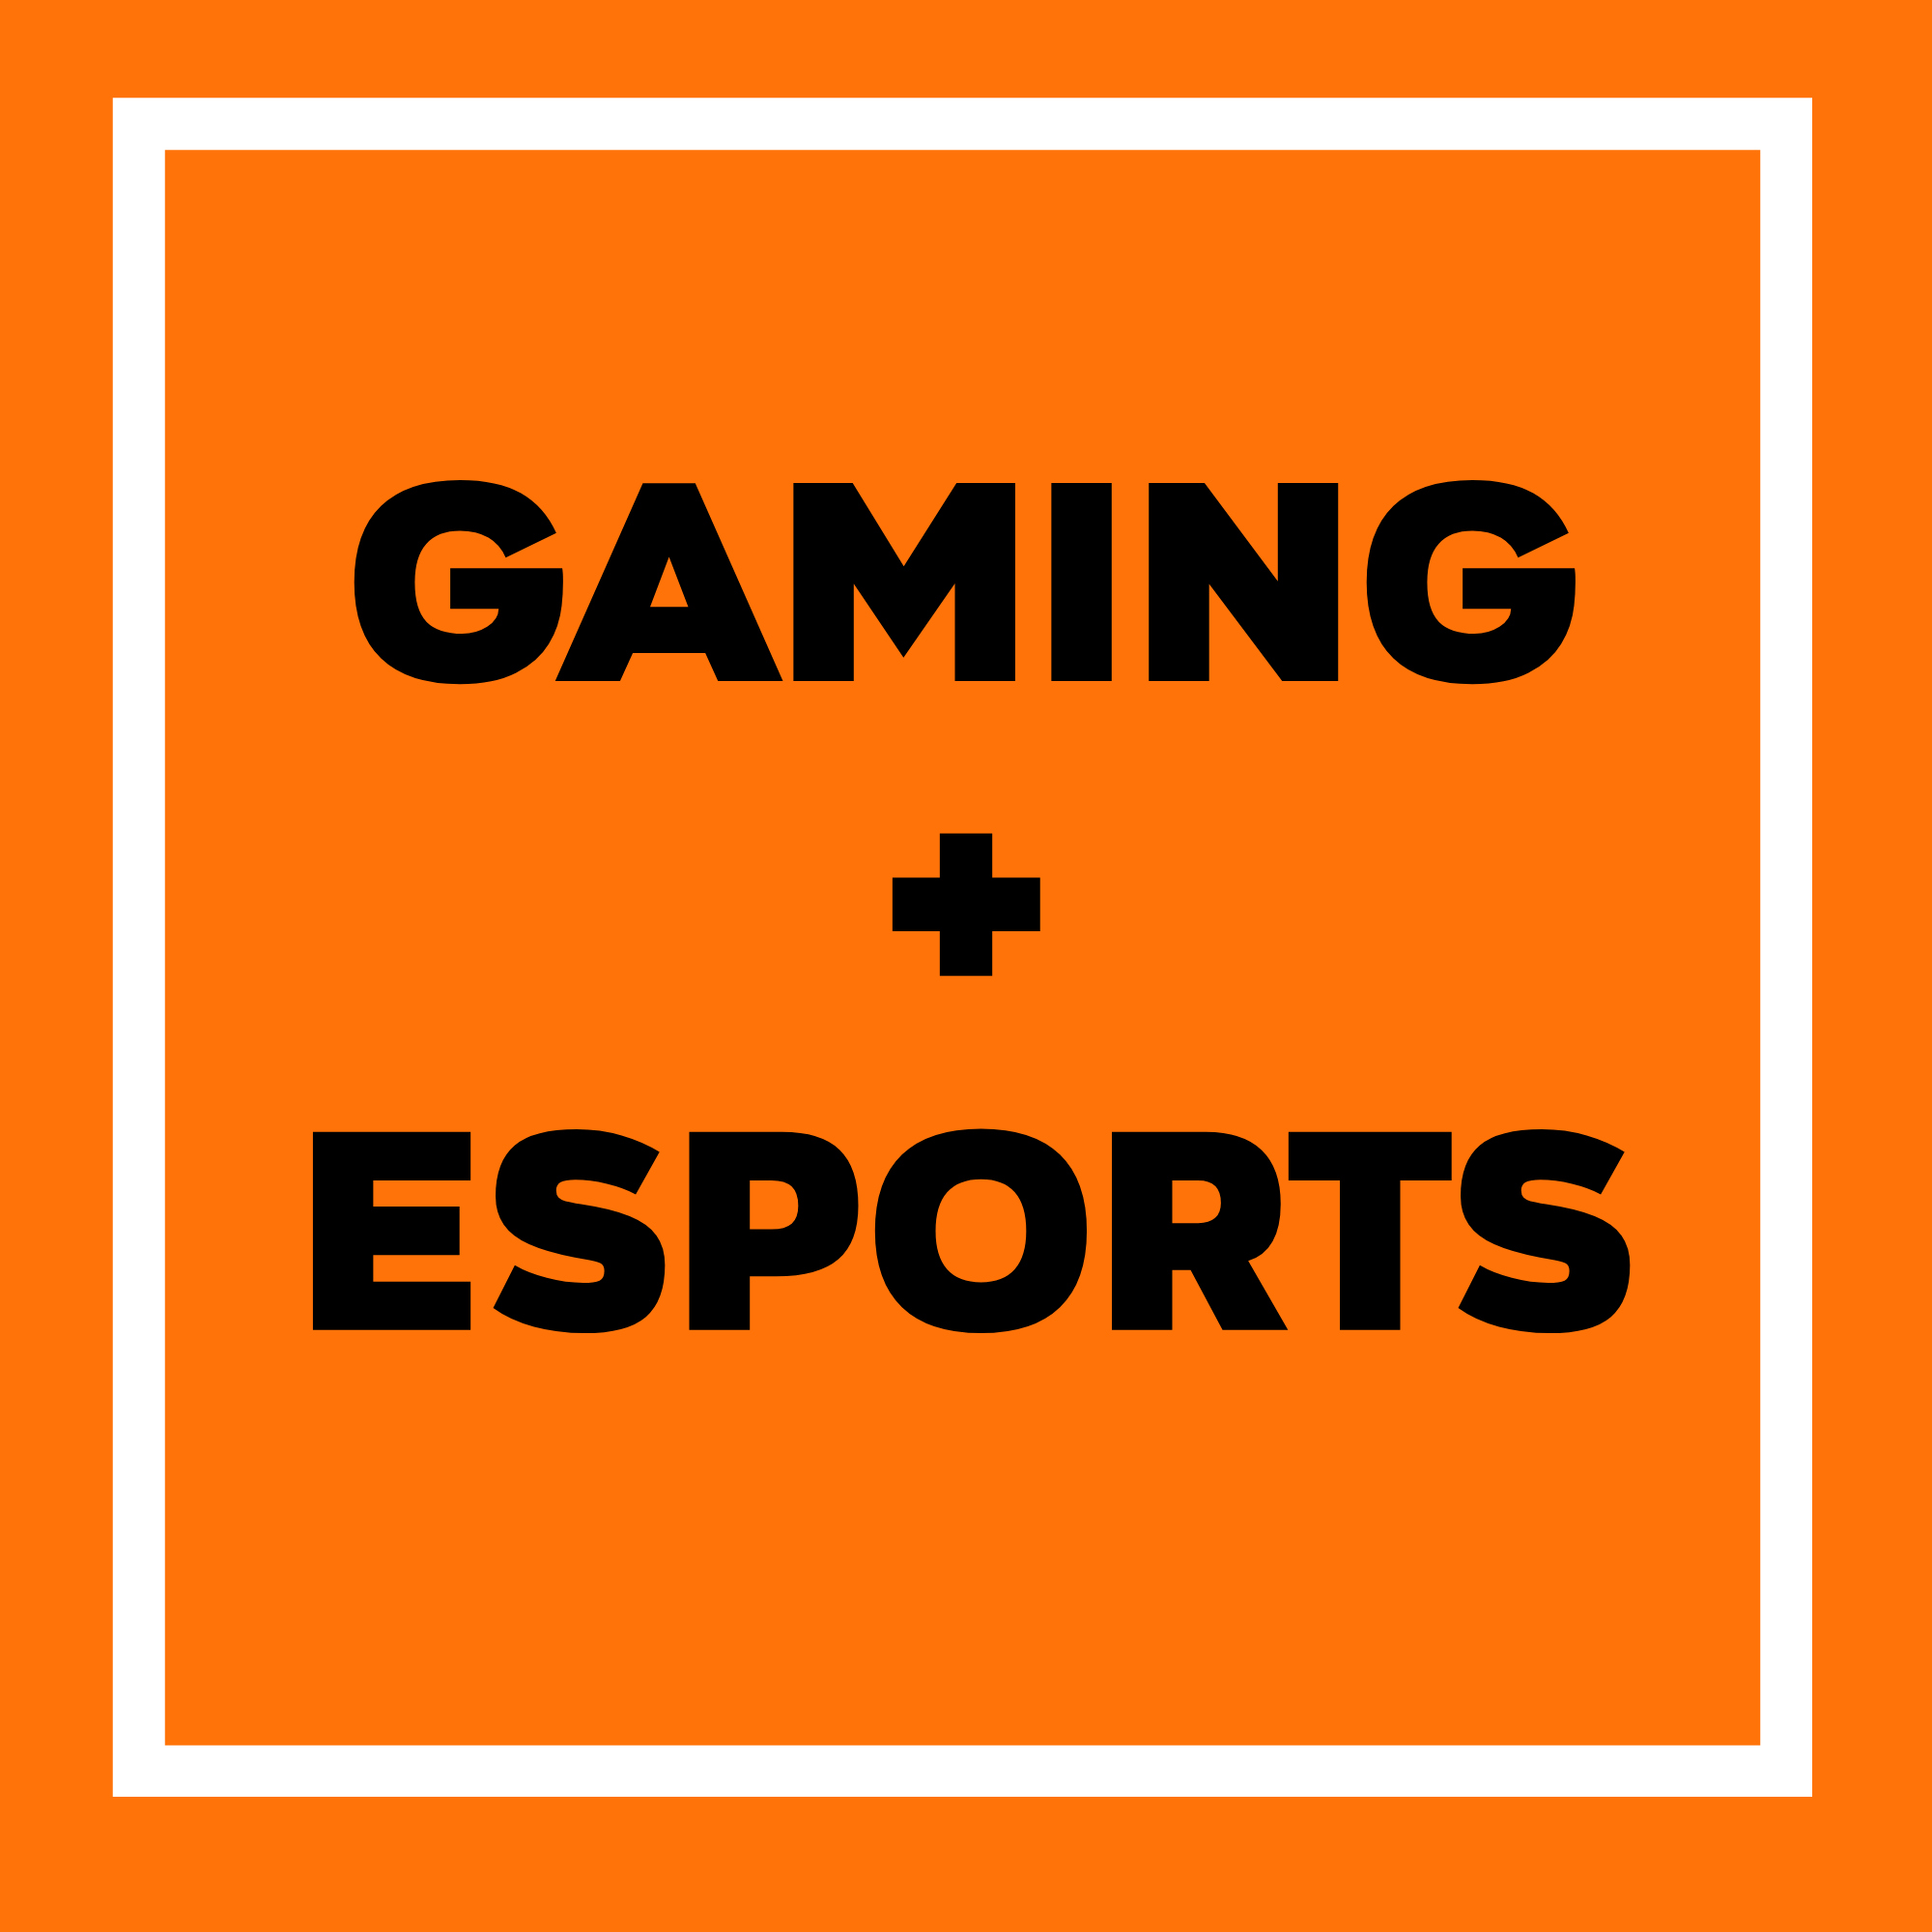 qc-gamingesports.jpg